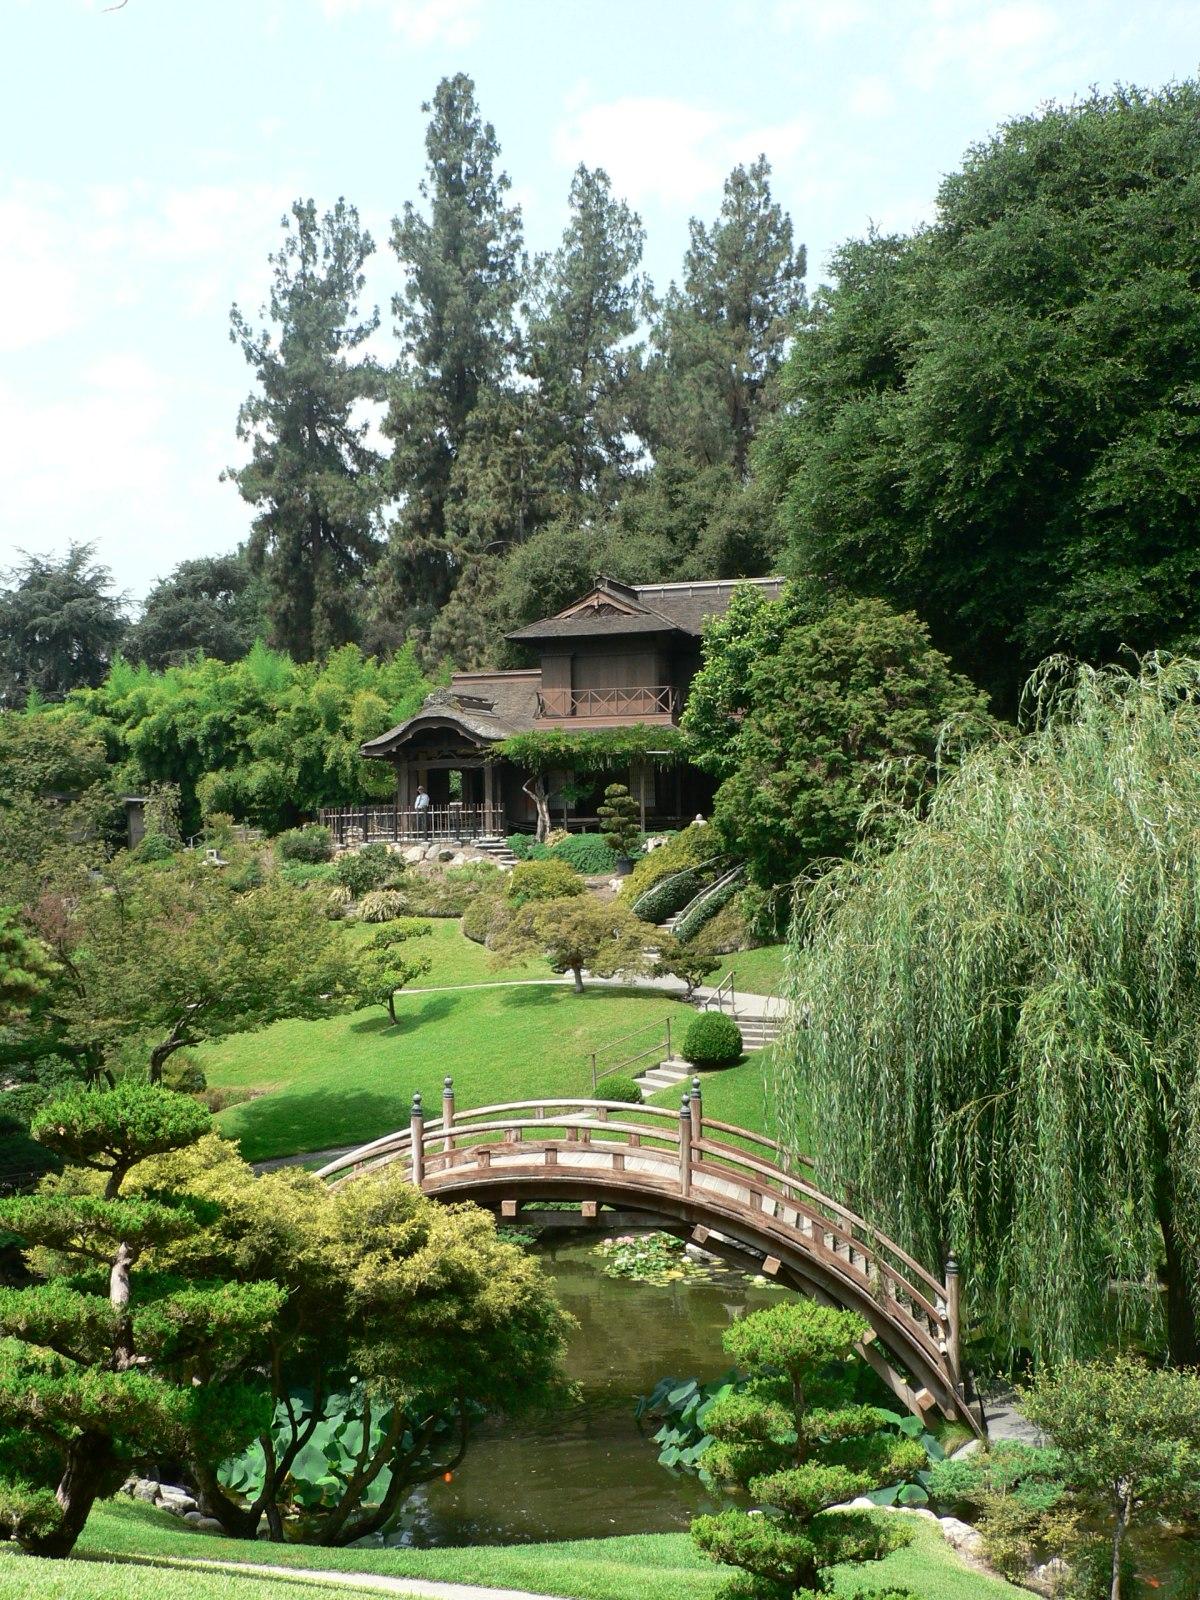 File:Japanese Garden At Huntington Library.jpg